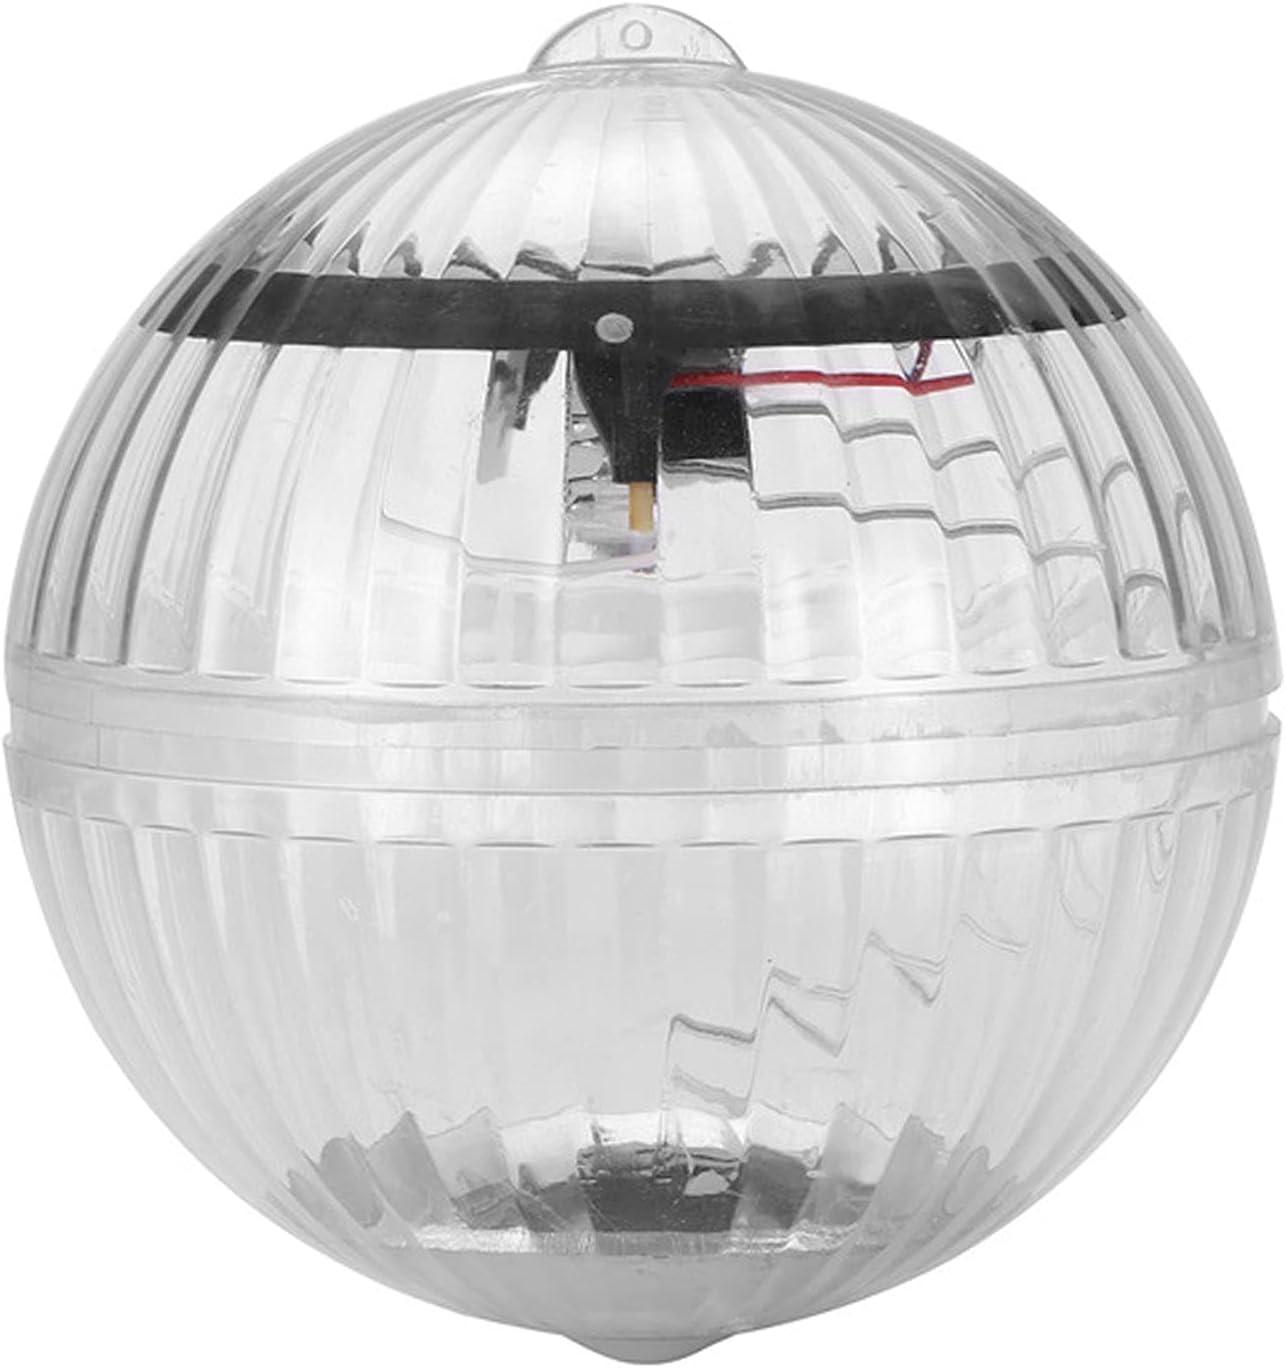 Bombing new work GQFGYYL-QD Submersible LED Max 66% OFF Light Waterproof IP68 Solar Swimming